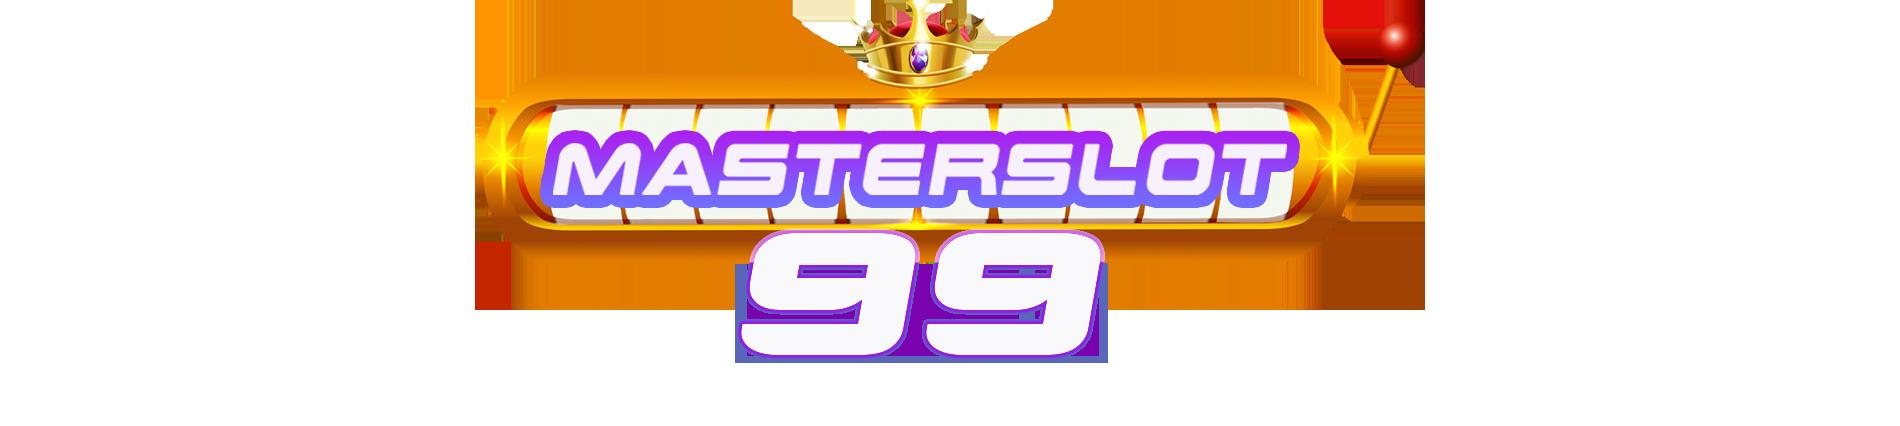 MASTERSLOT99 SLOT88 Slot Deposit Pulsa Tanpa Potongan 2021